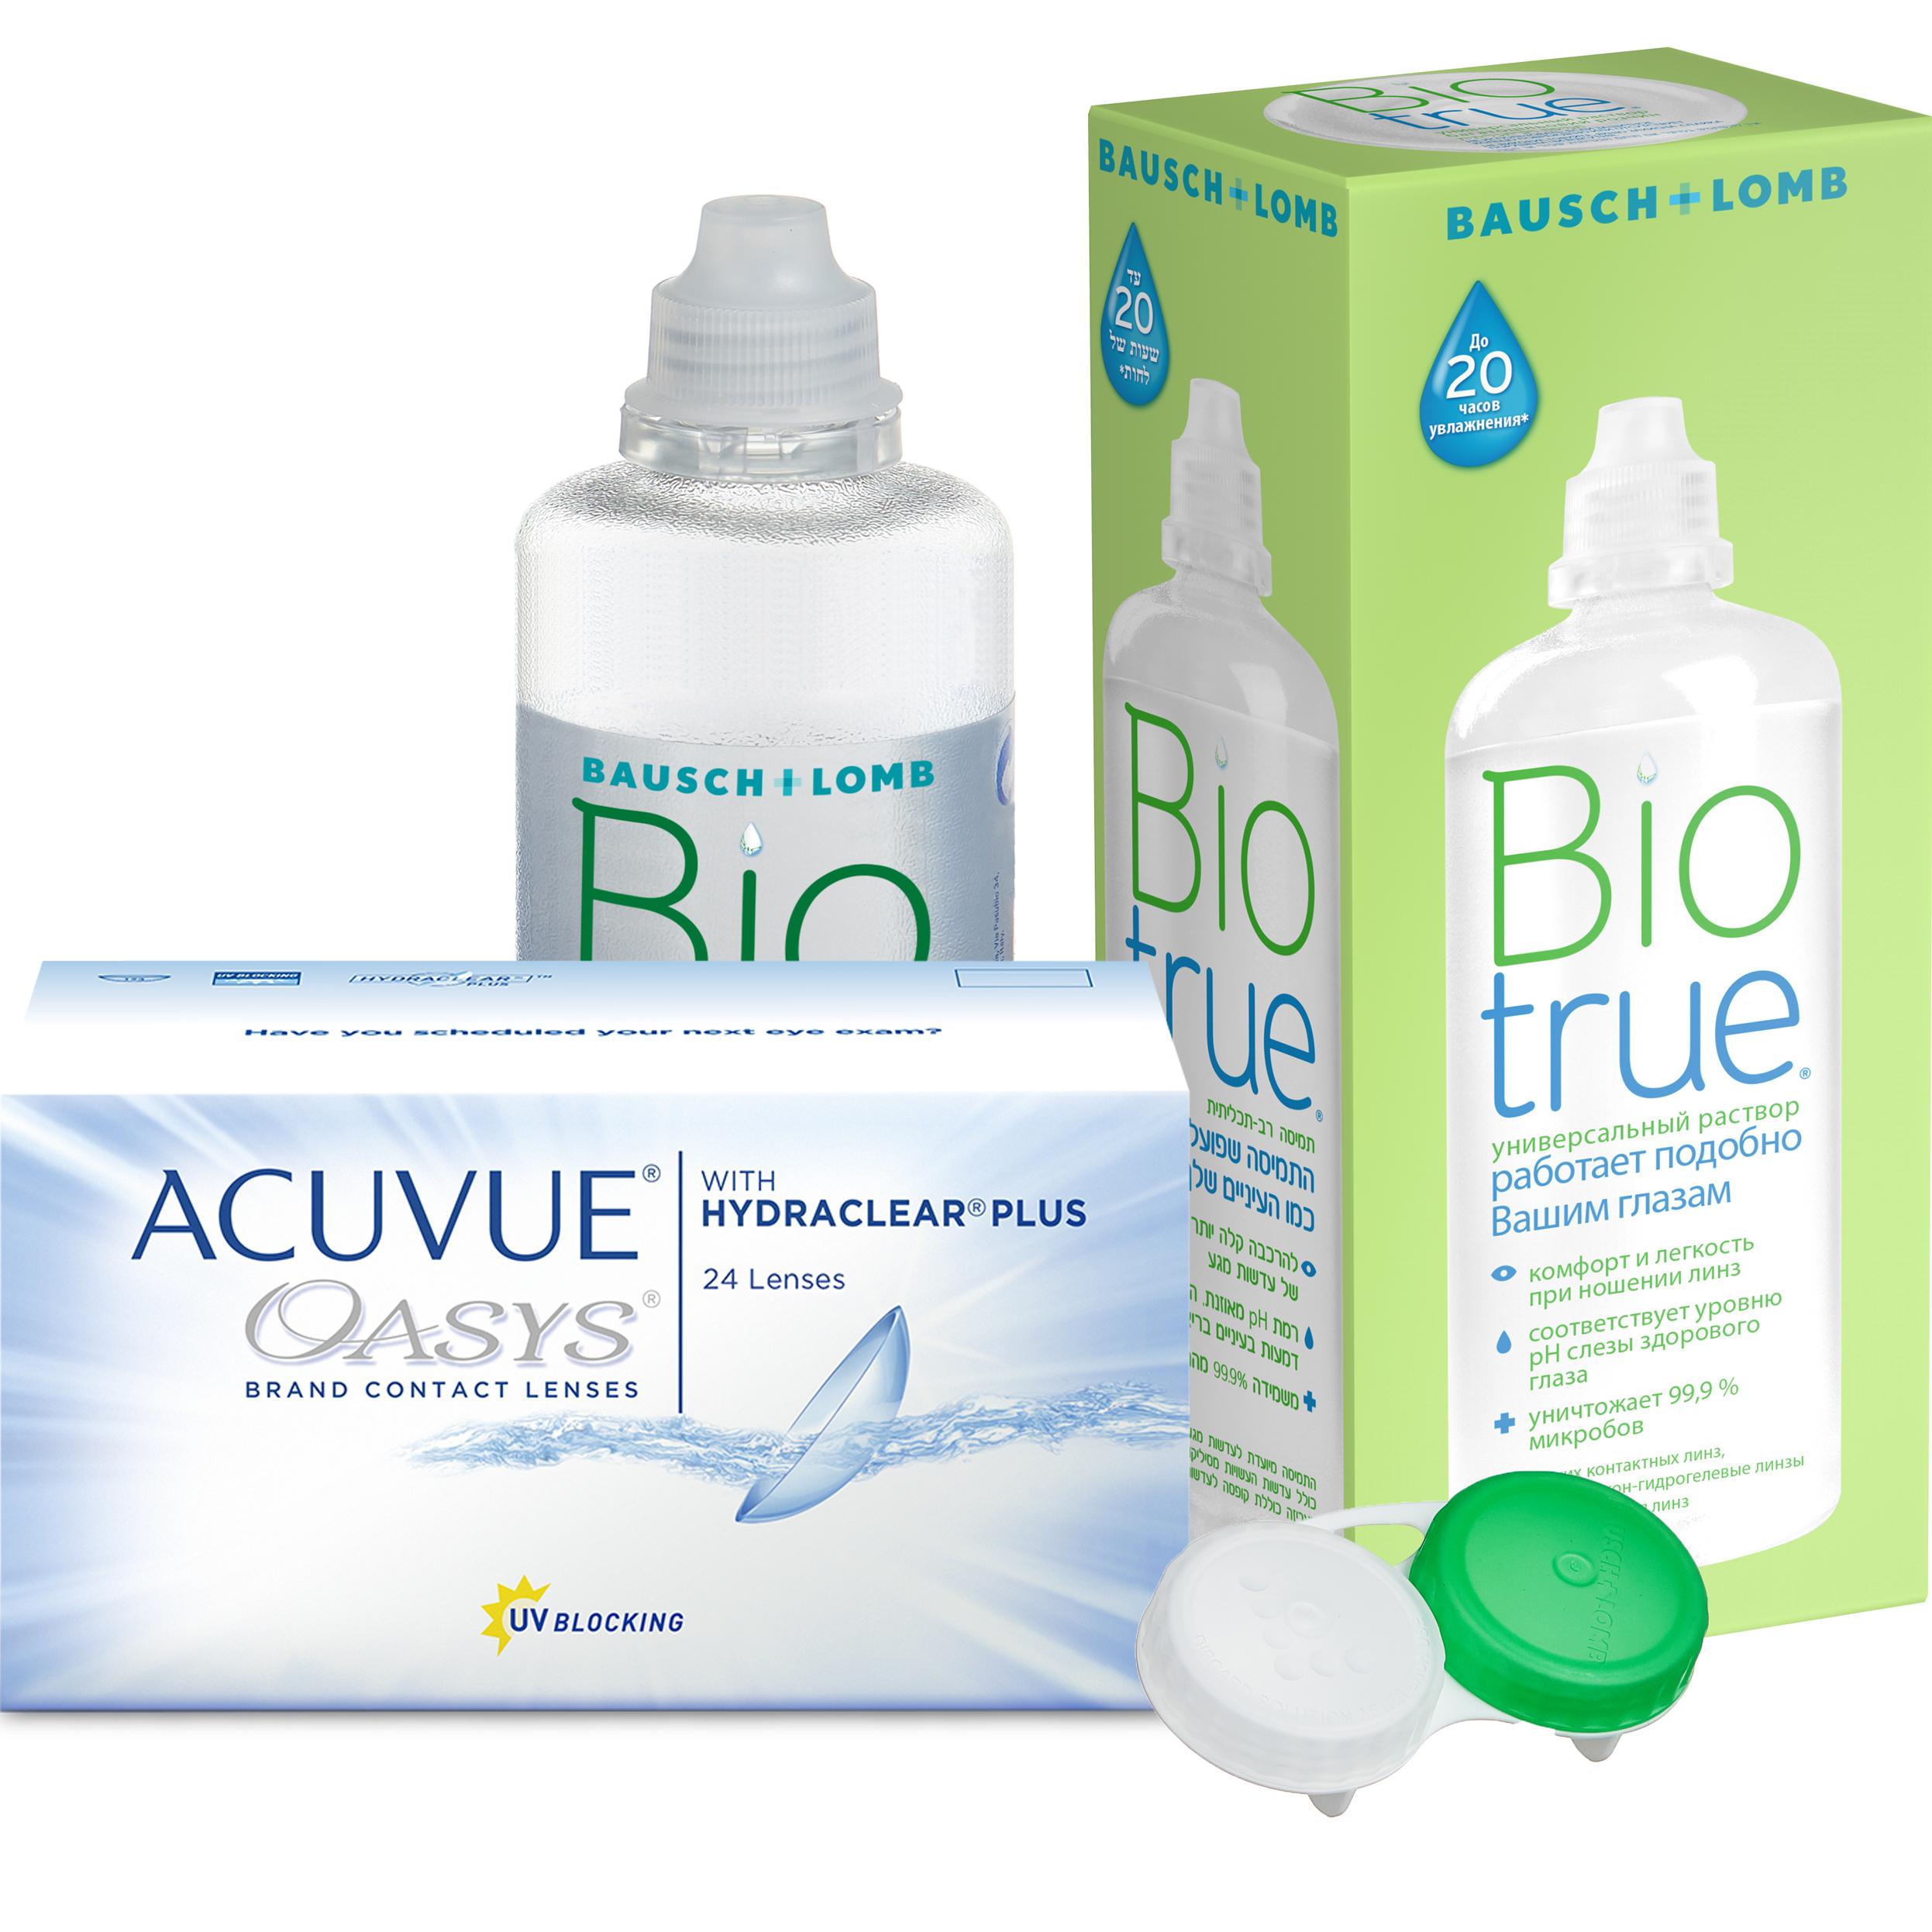 Купить Oasys with Hydraclear Plus 24 линзы + Biotrue, Контактные линзы Acuvue Oasys with Hydraclear Plus 24 линзы R 8.4 +4, 50 + Biotrue 300 мл